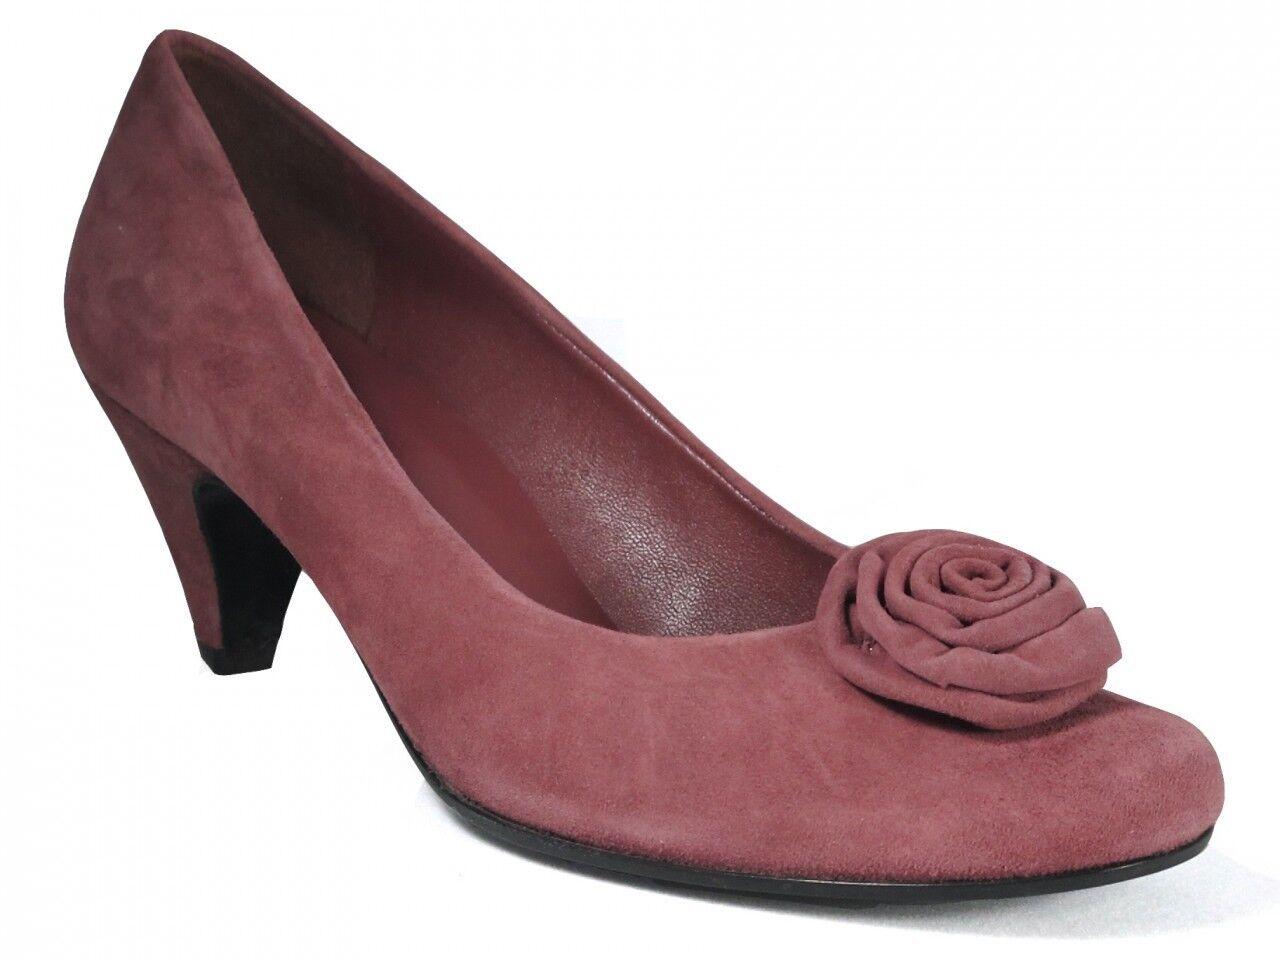 Ana Bonilla Women's Dressy Italian Suede Leather  shoes 4553